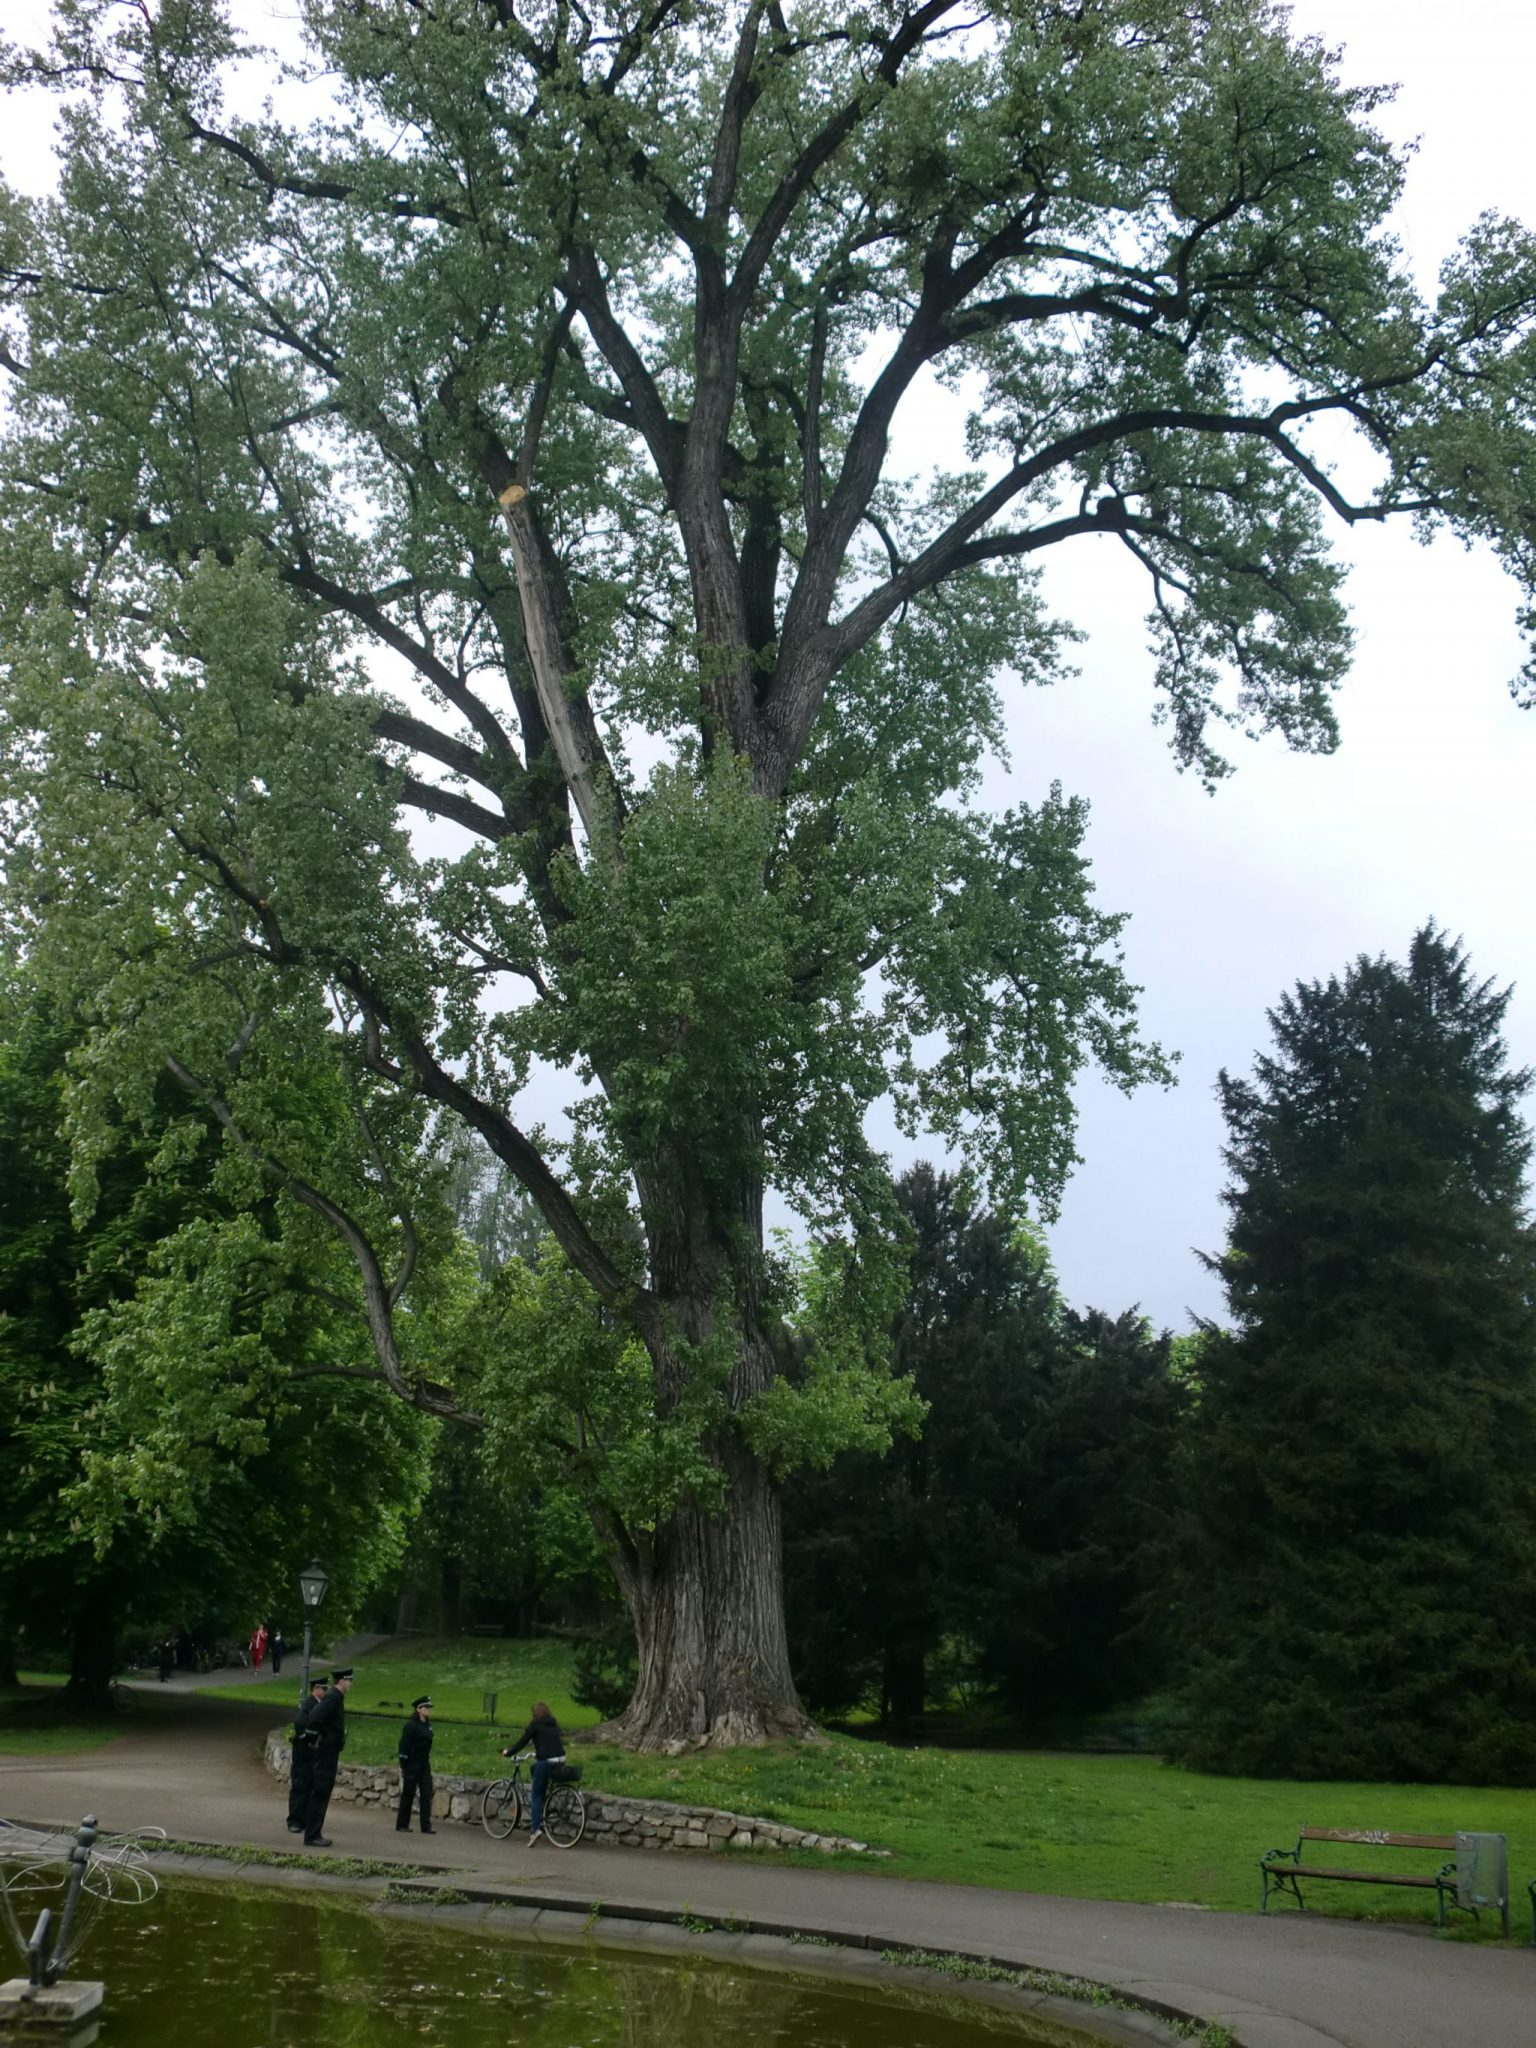 Graz park 9 - Graz: tradition and modernity